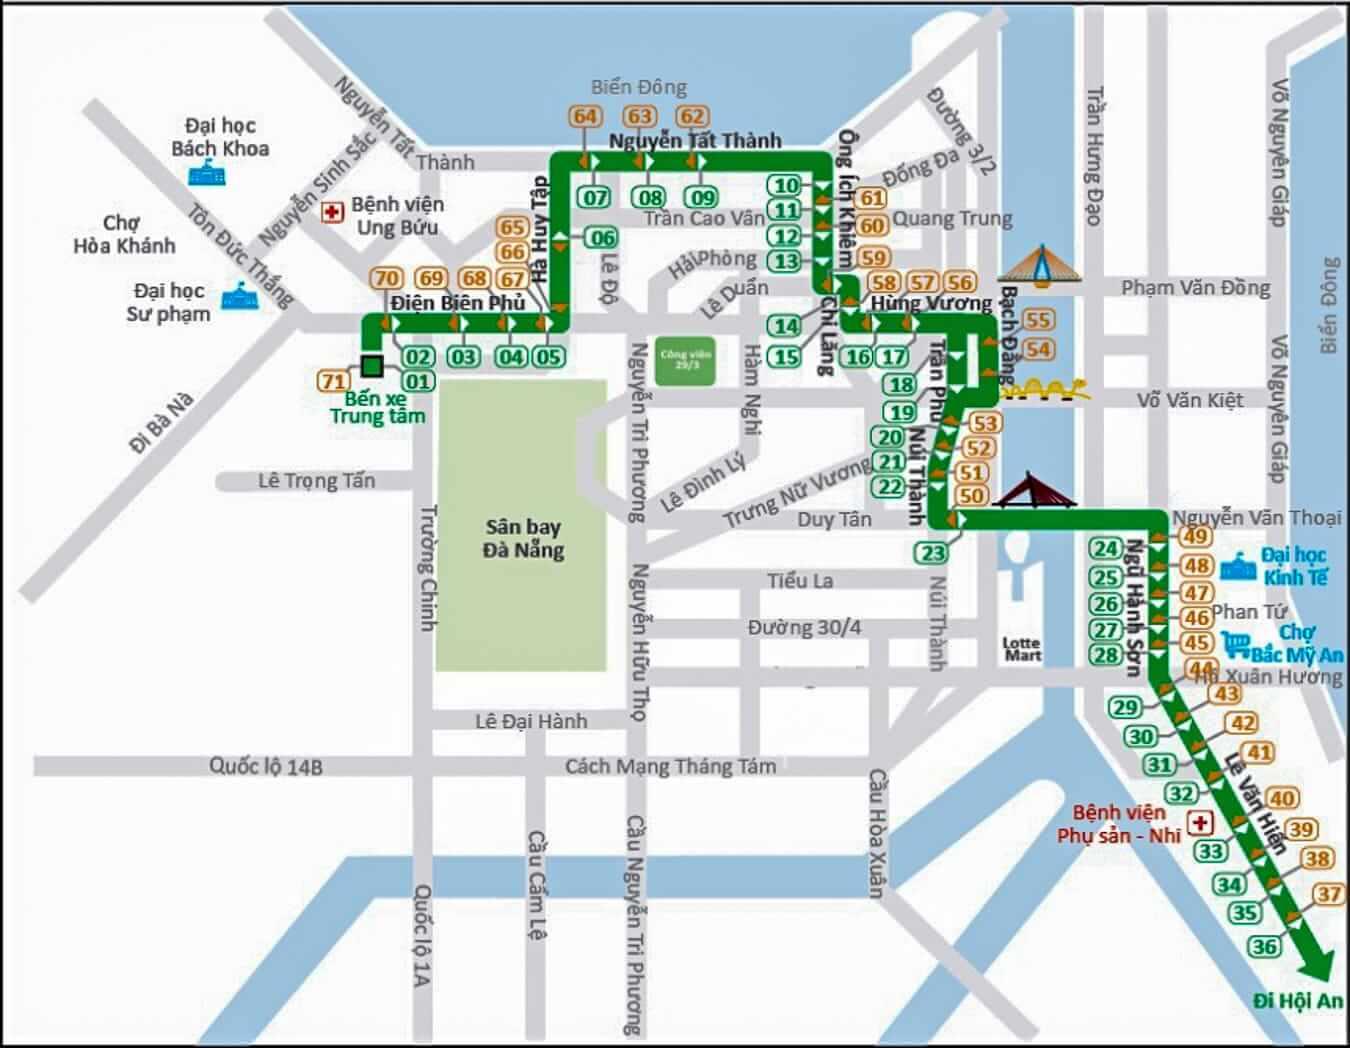 Hoi An to Da Nang bus route map: Hoi An bus station